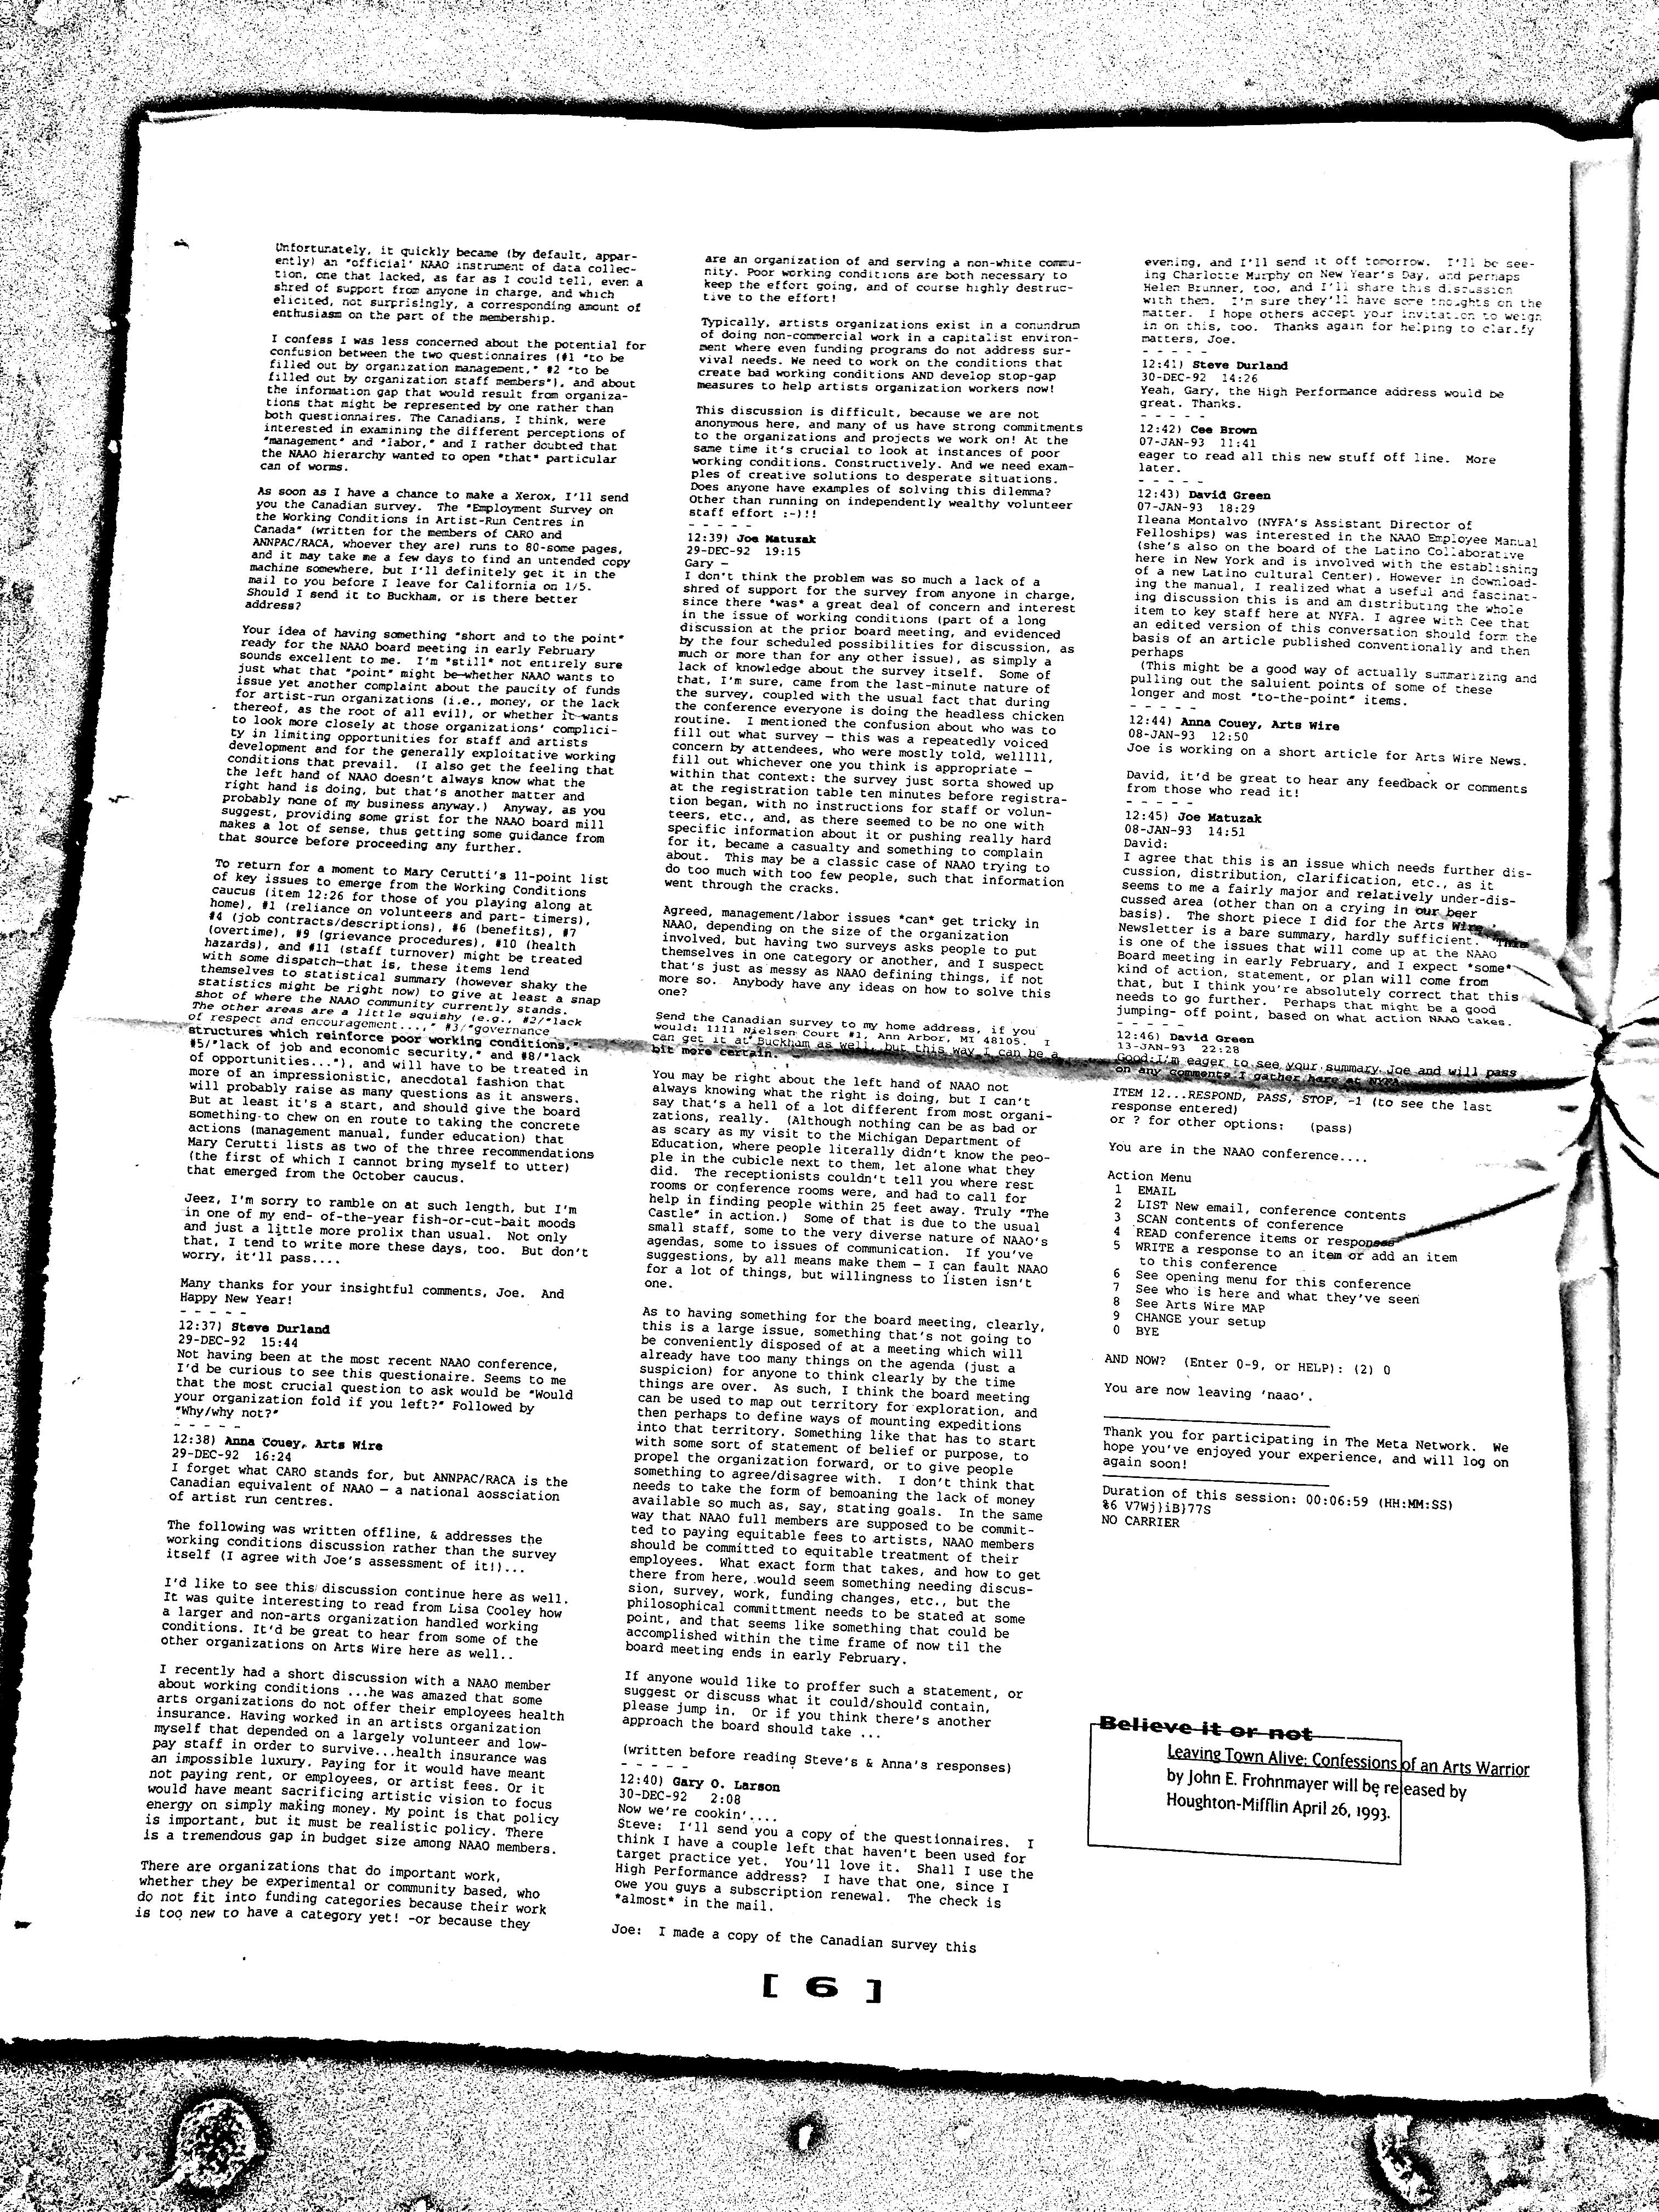 April 1993 - NAAO Bulletin Page 6.jpg